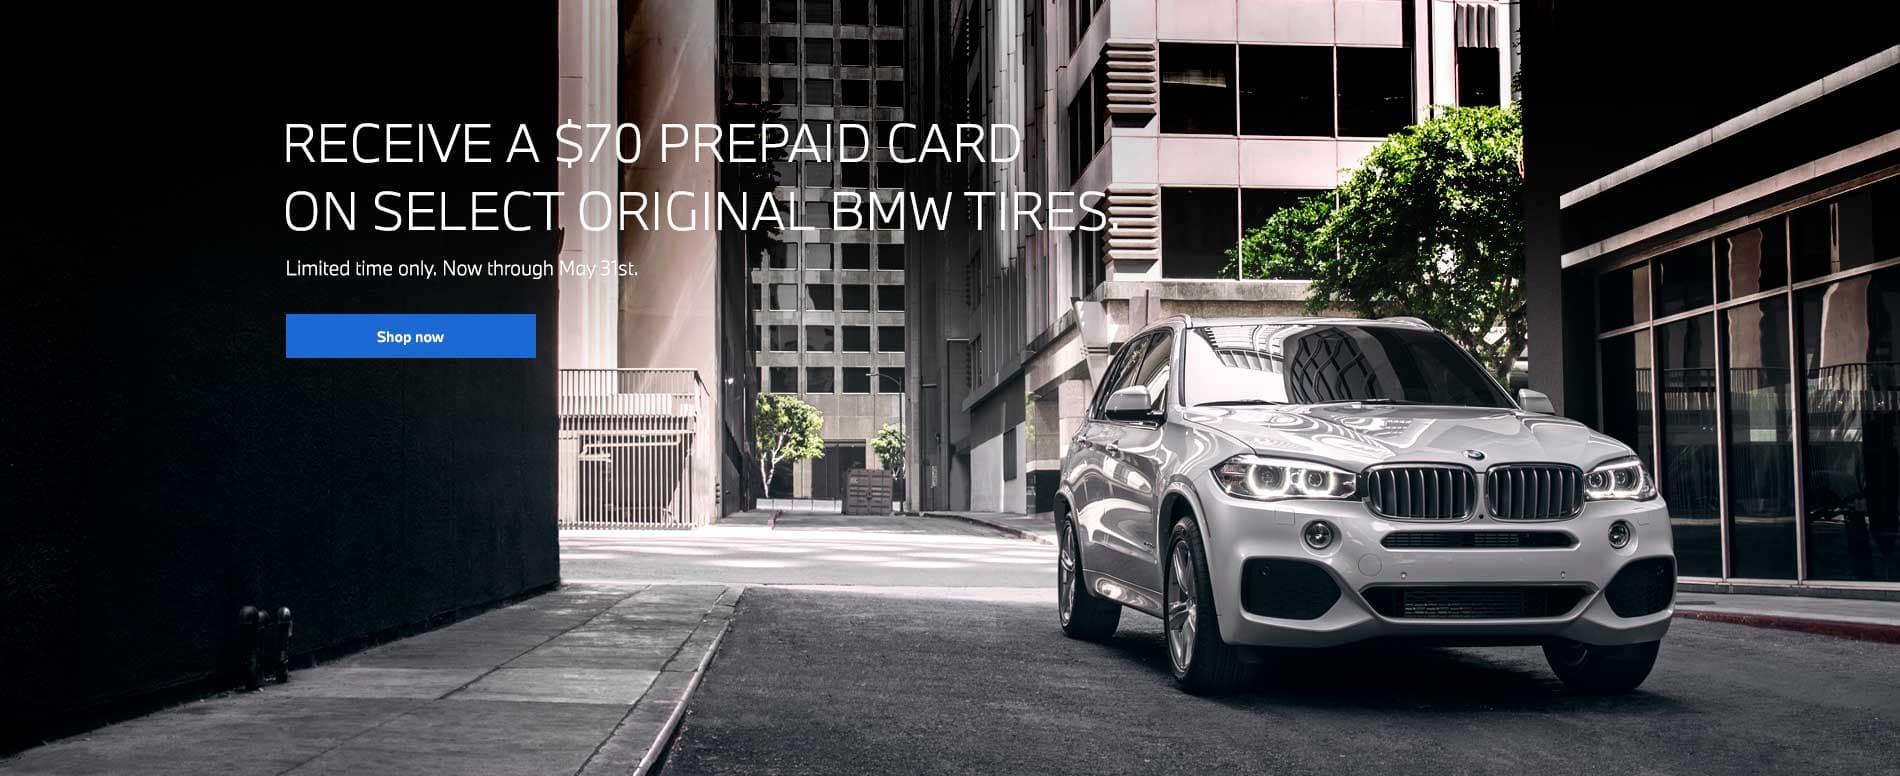 BMW_Spring21-TireRebate_DlrWebsite_1900x776